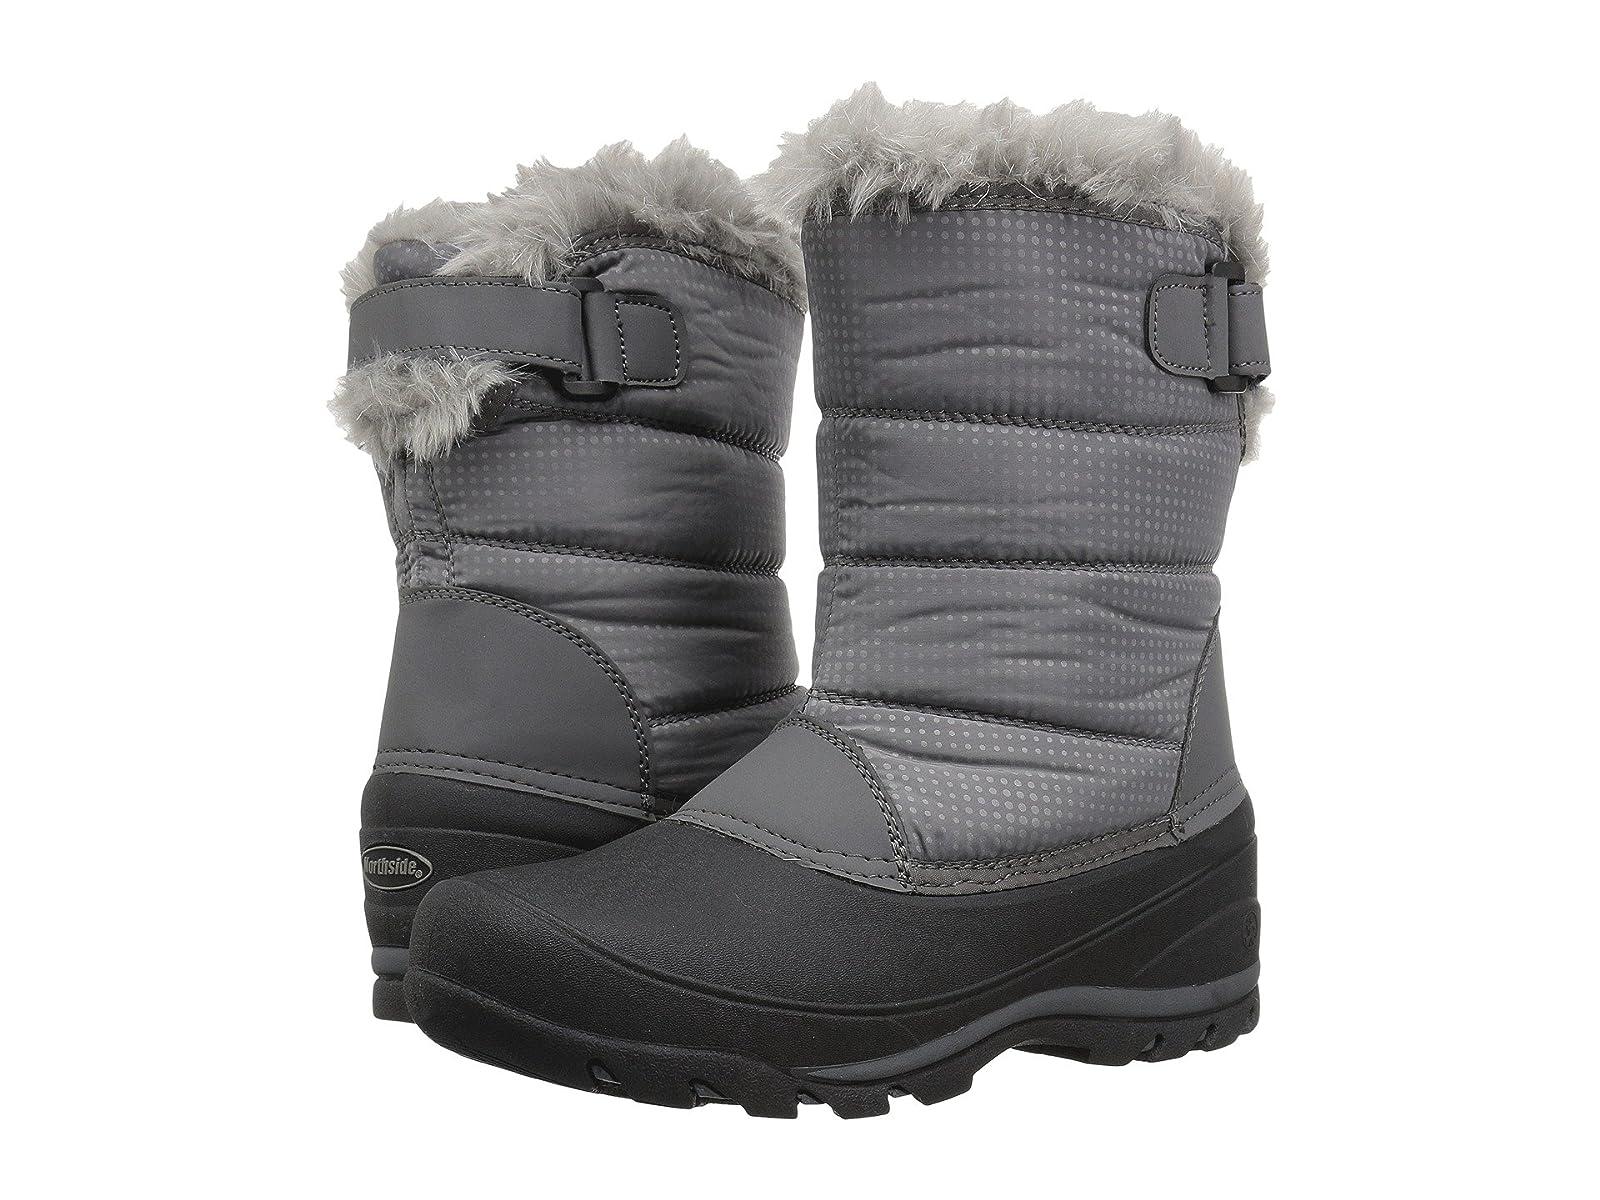 Northside Saint HelensCheap and distinctive eye-catching shoes